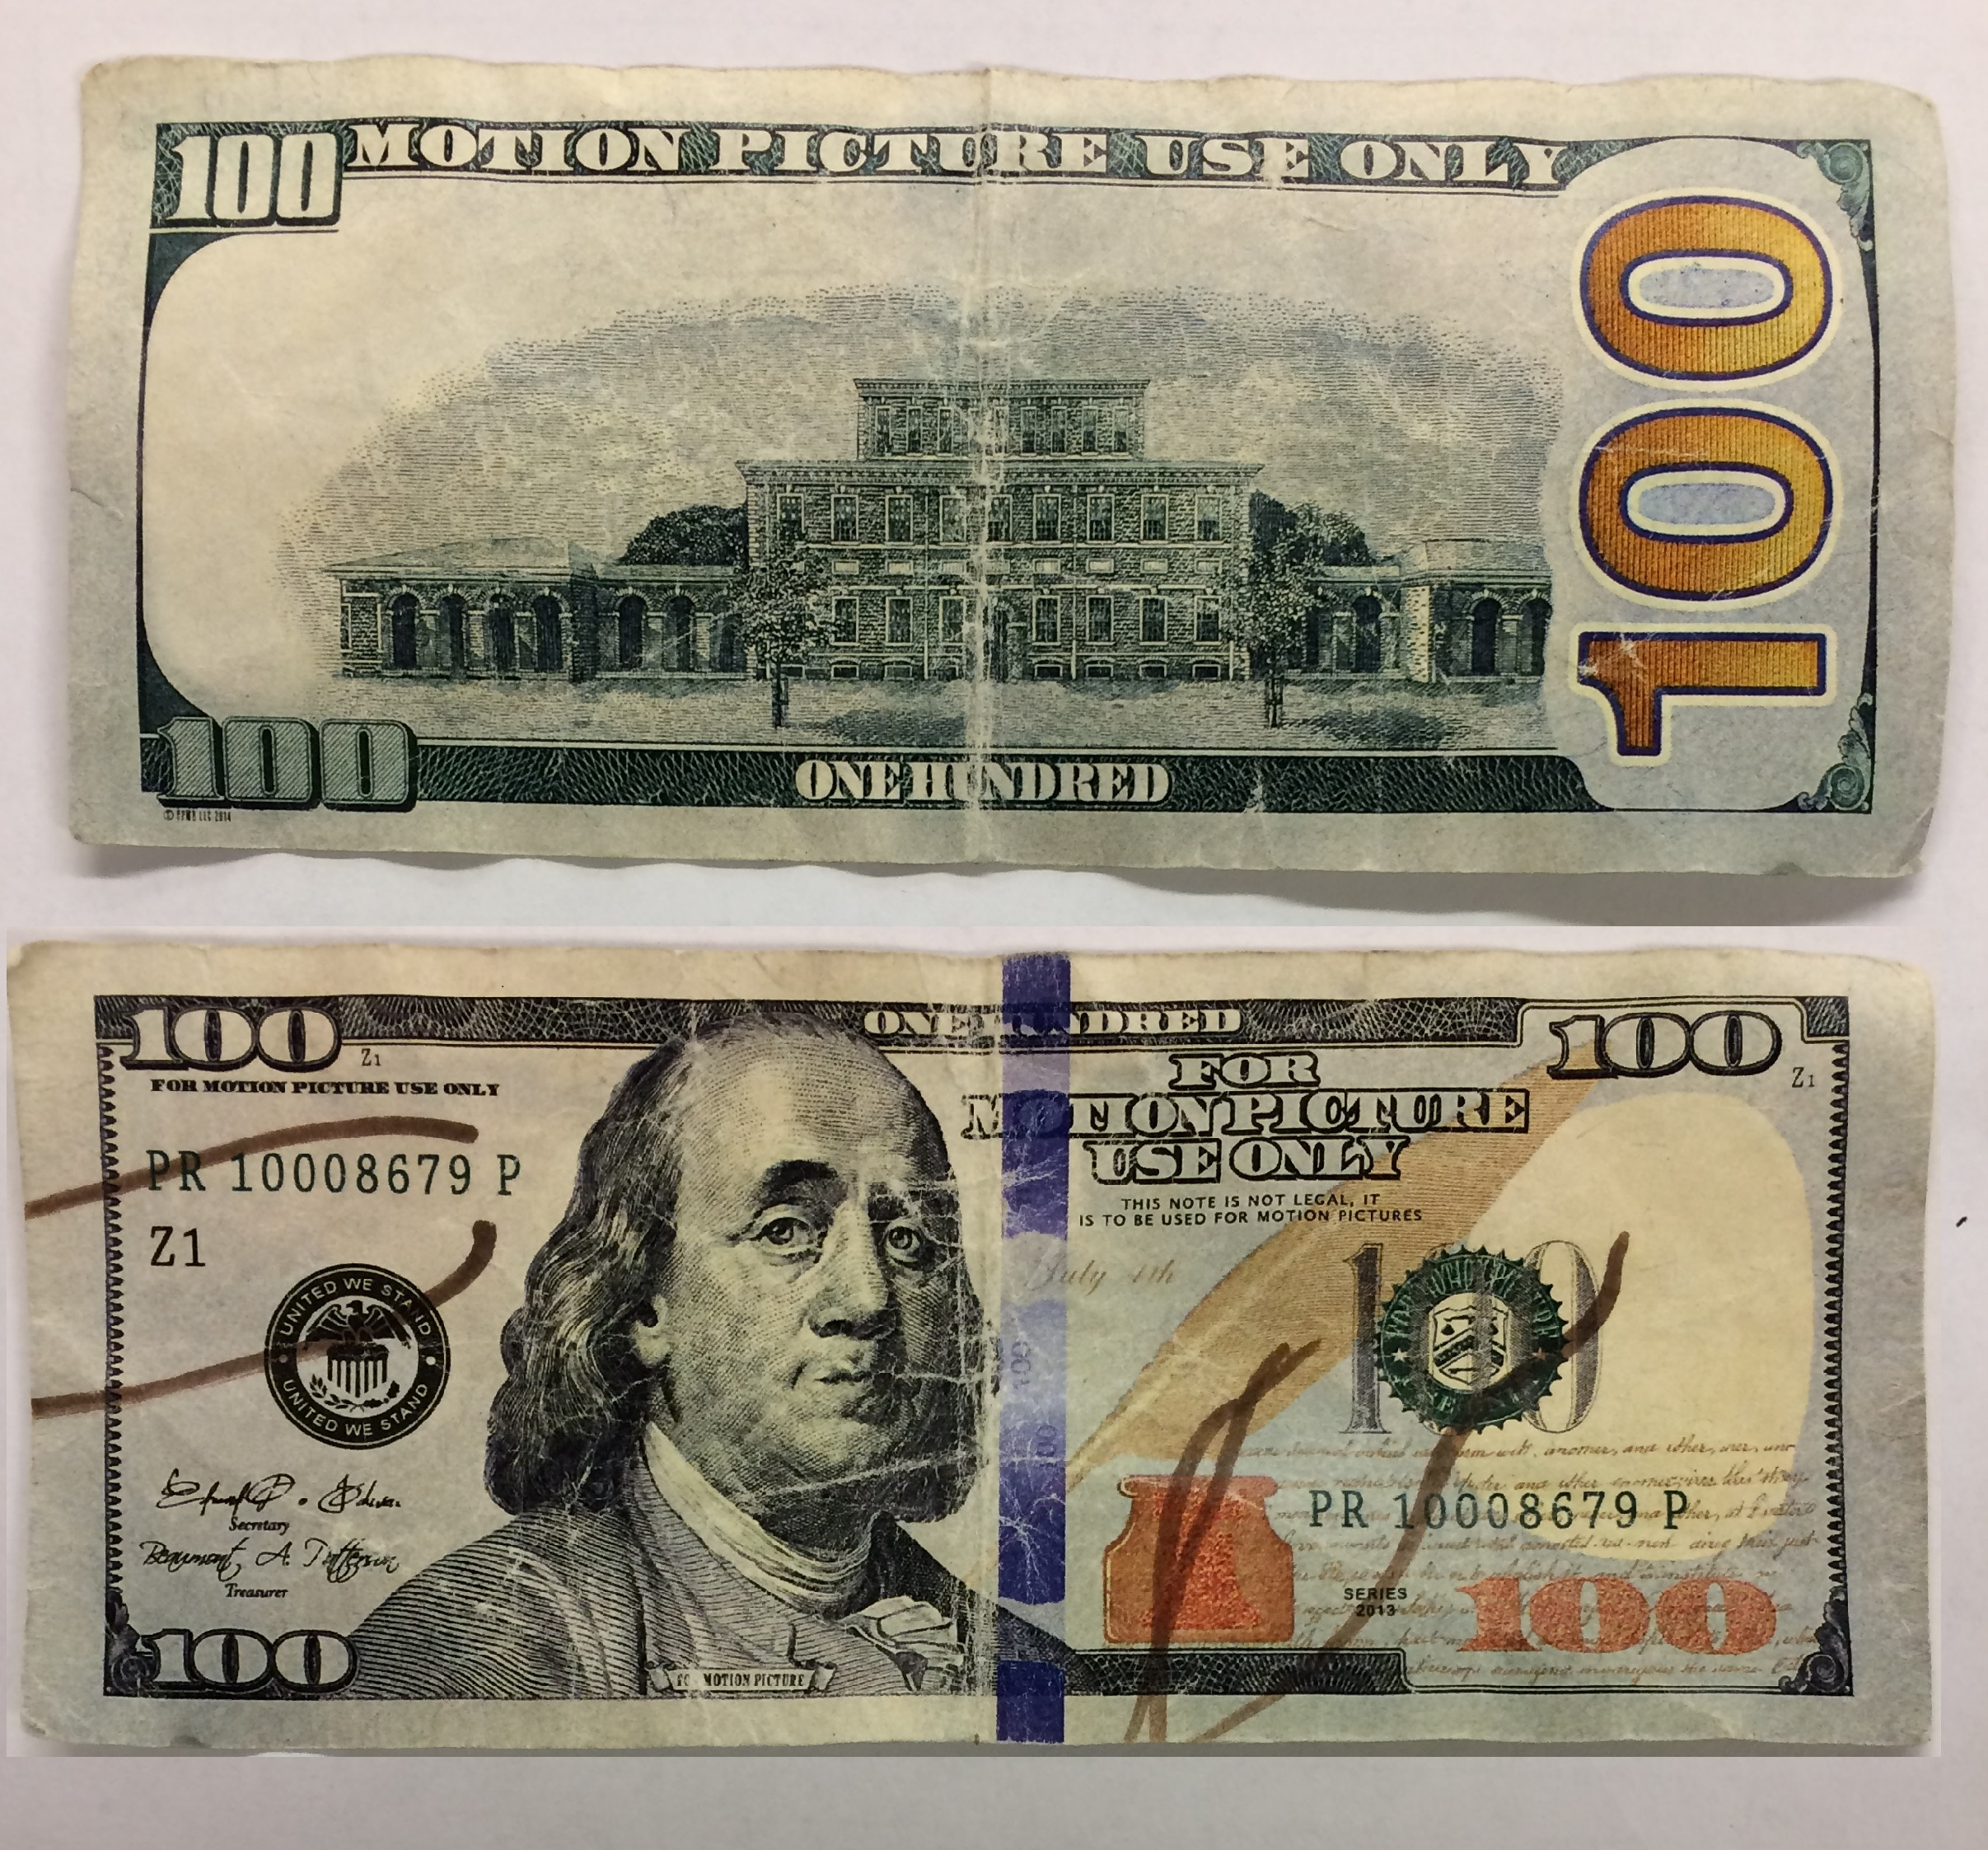 Movie prop money looks like the real thing, Cheektowaga police warn.